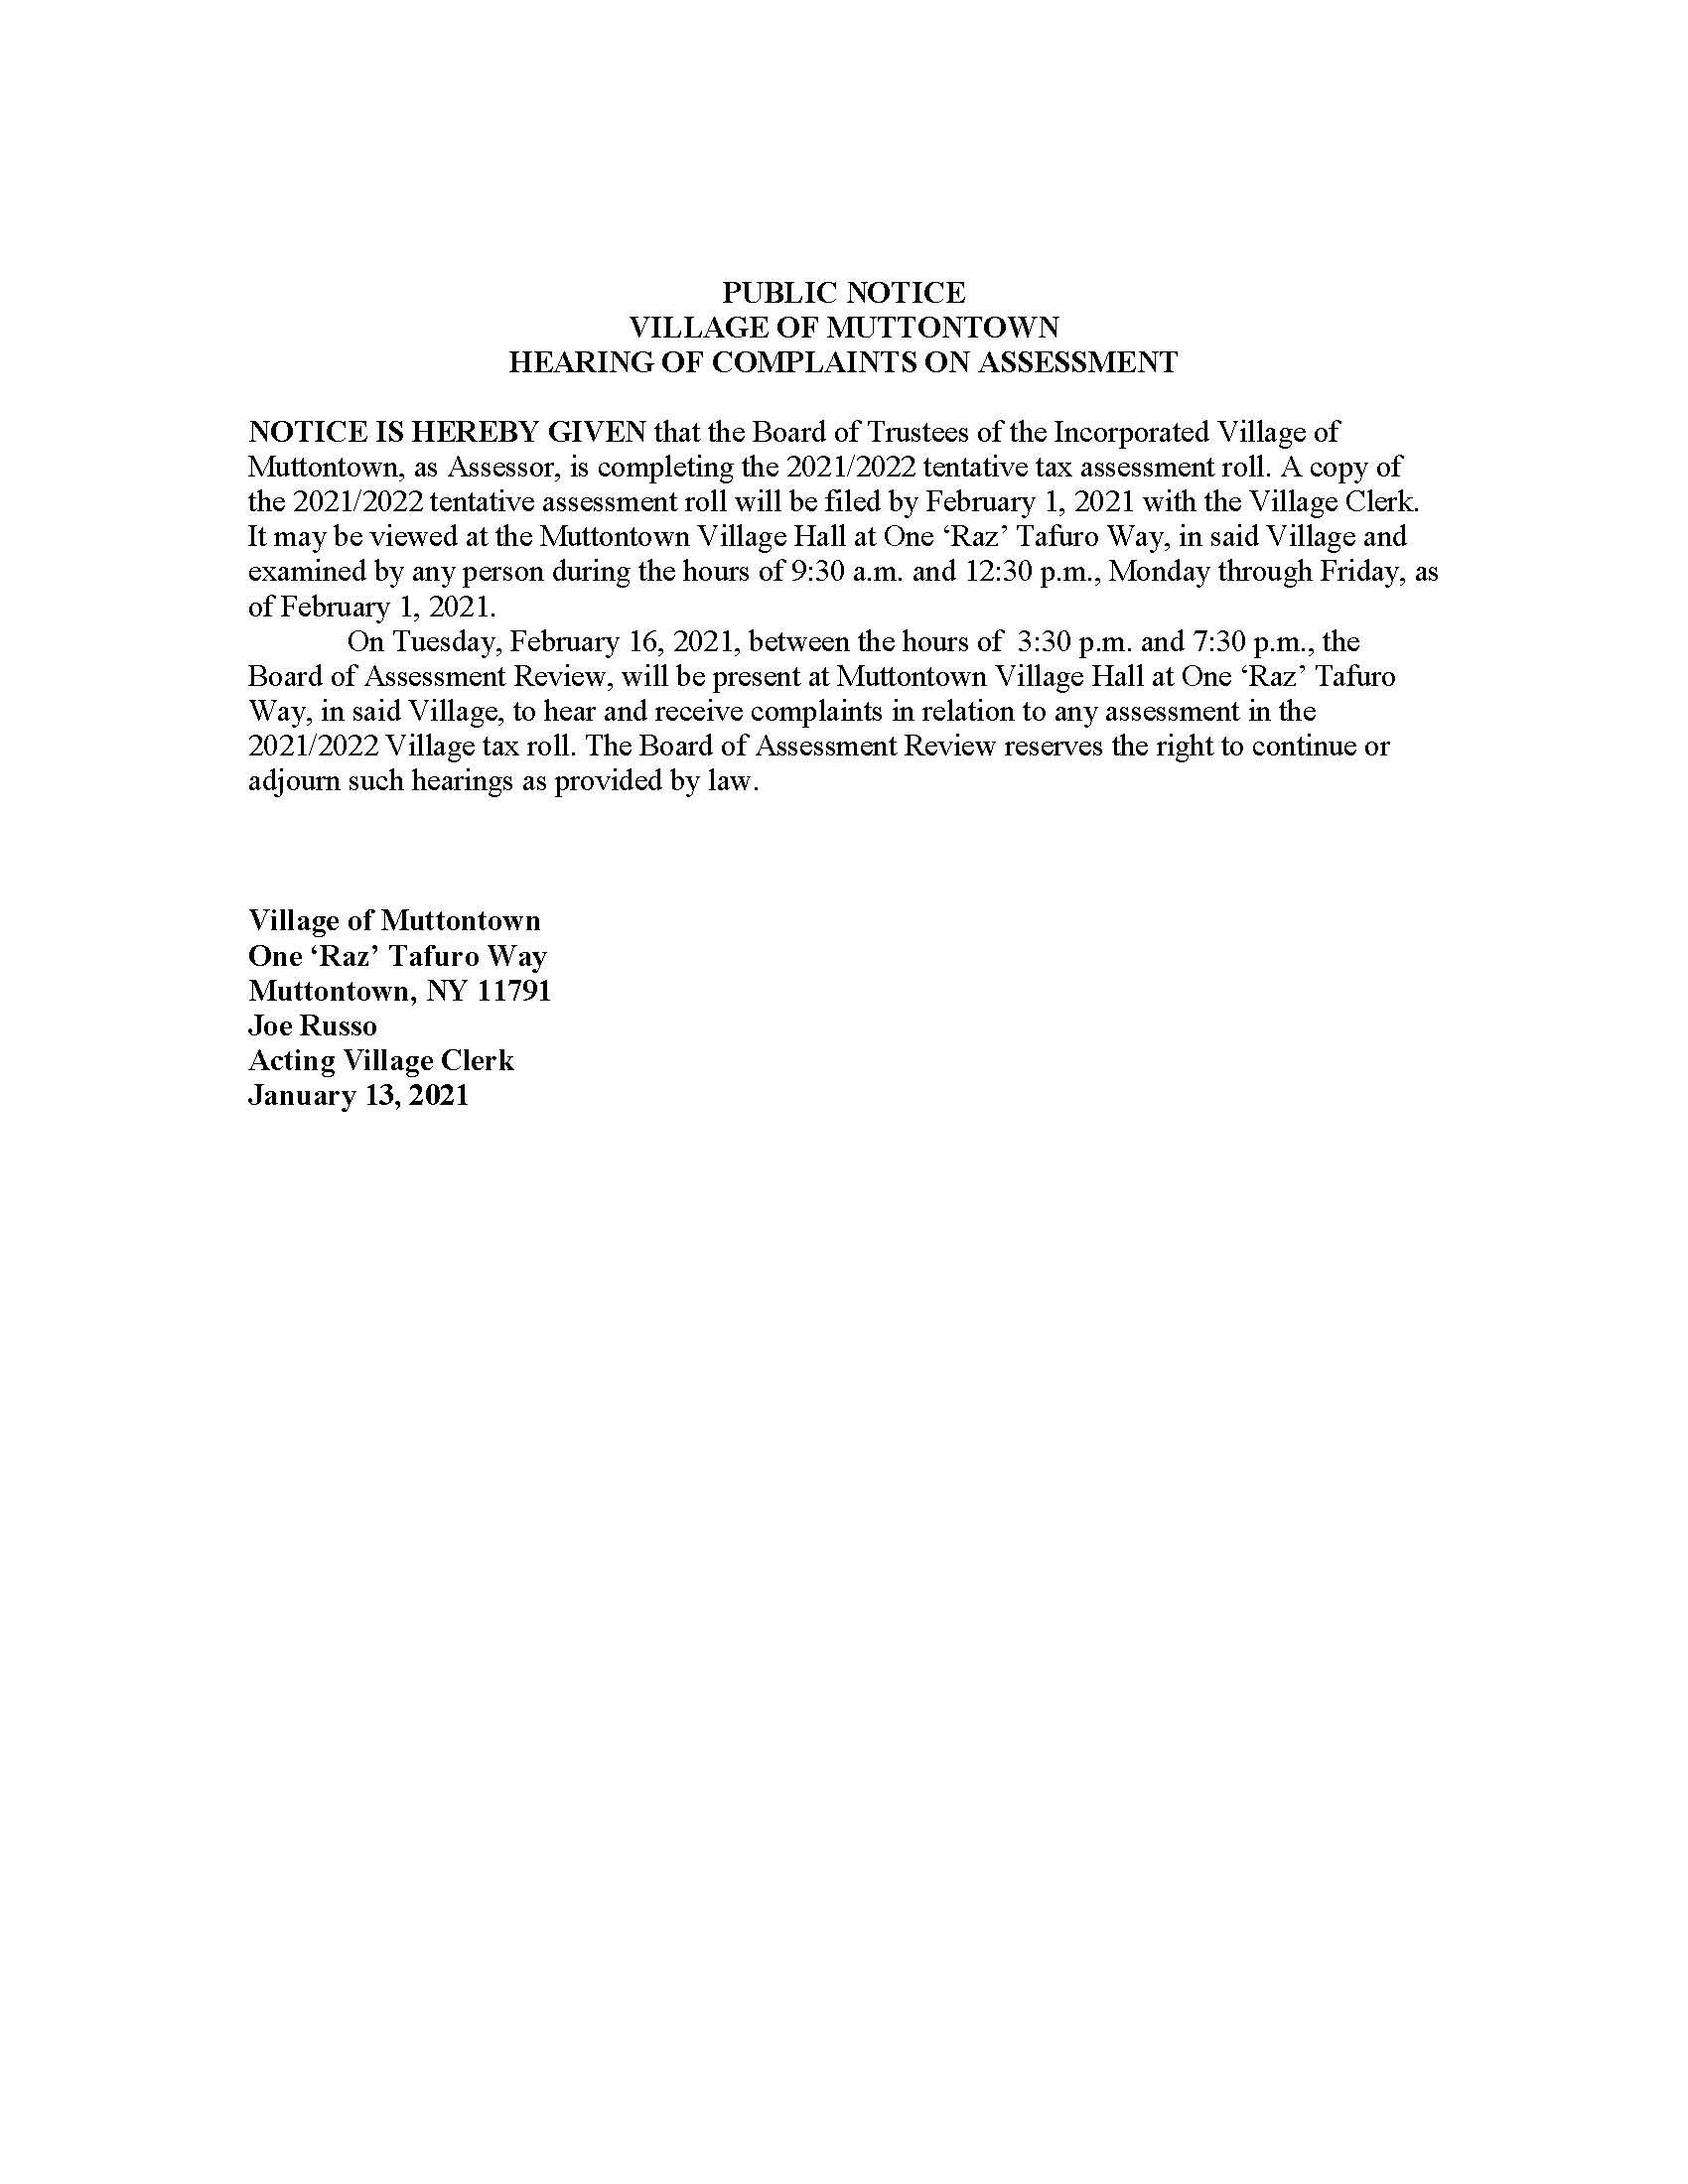 Public Notice 2021-2022 Tentative Assessment Roll